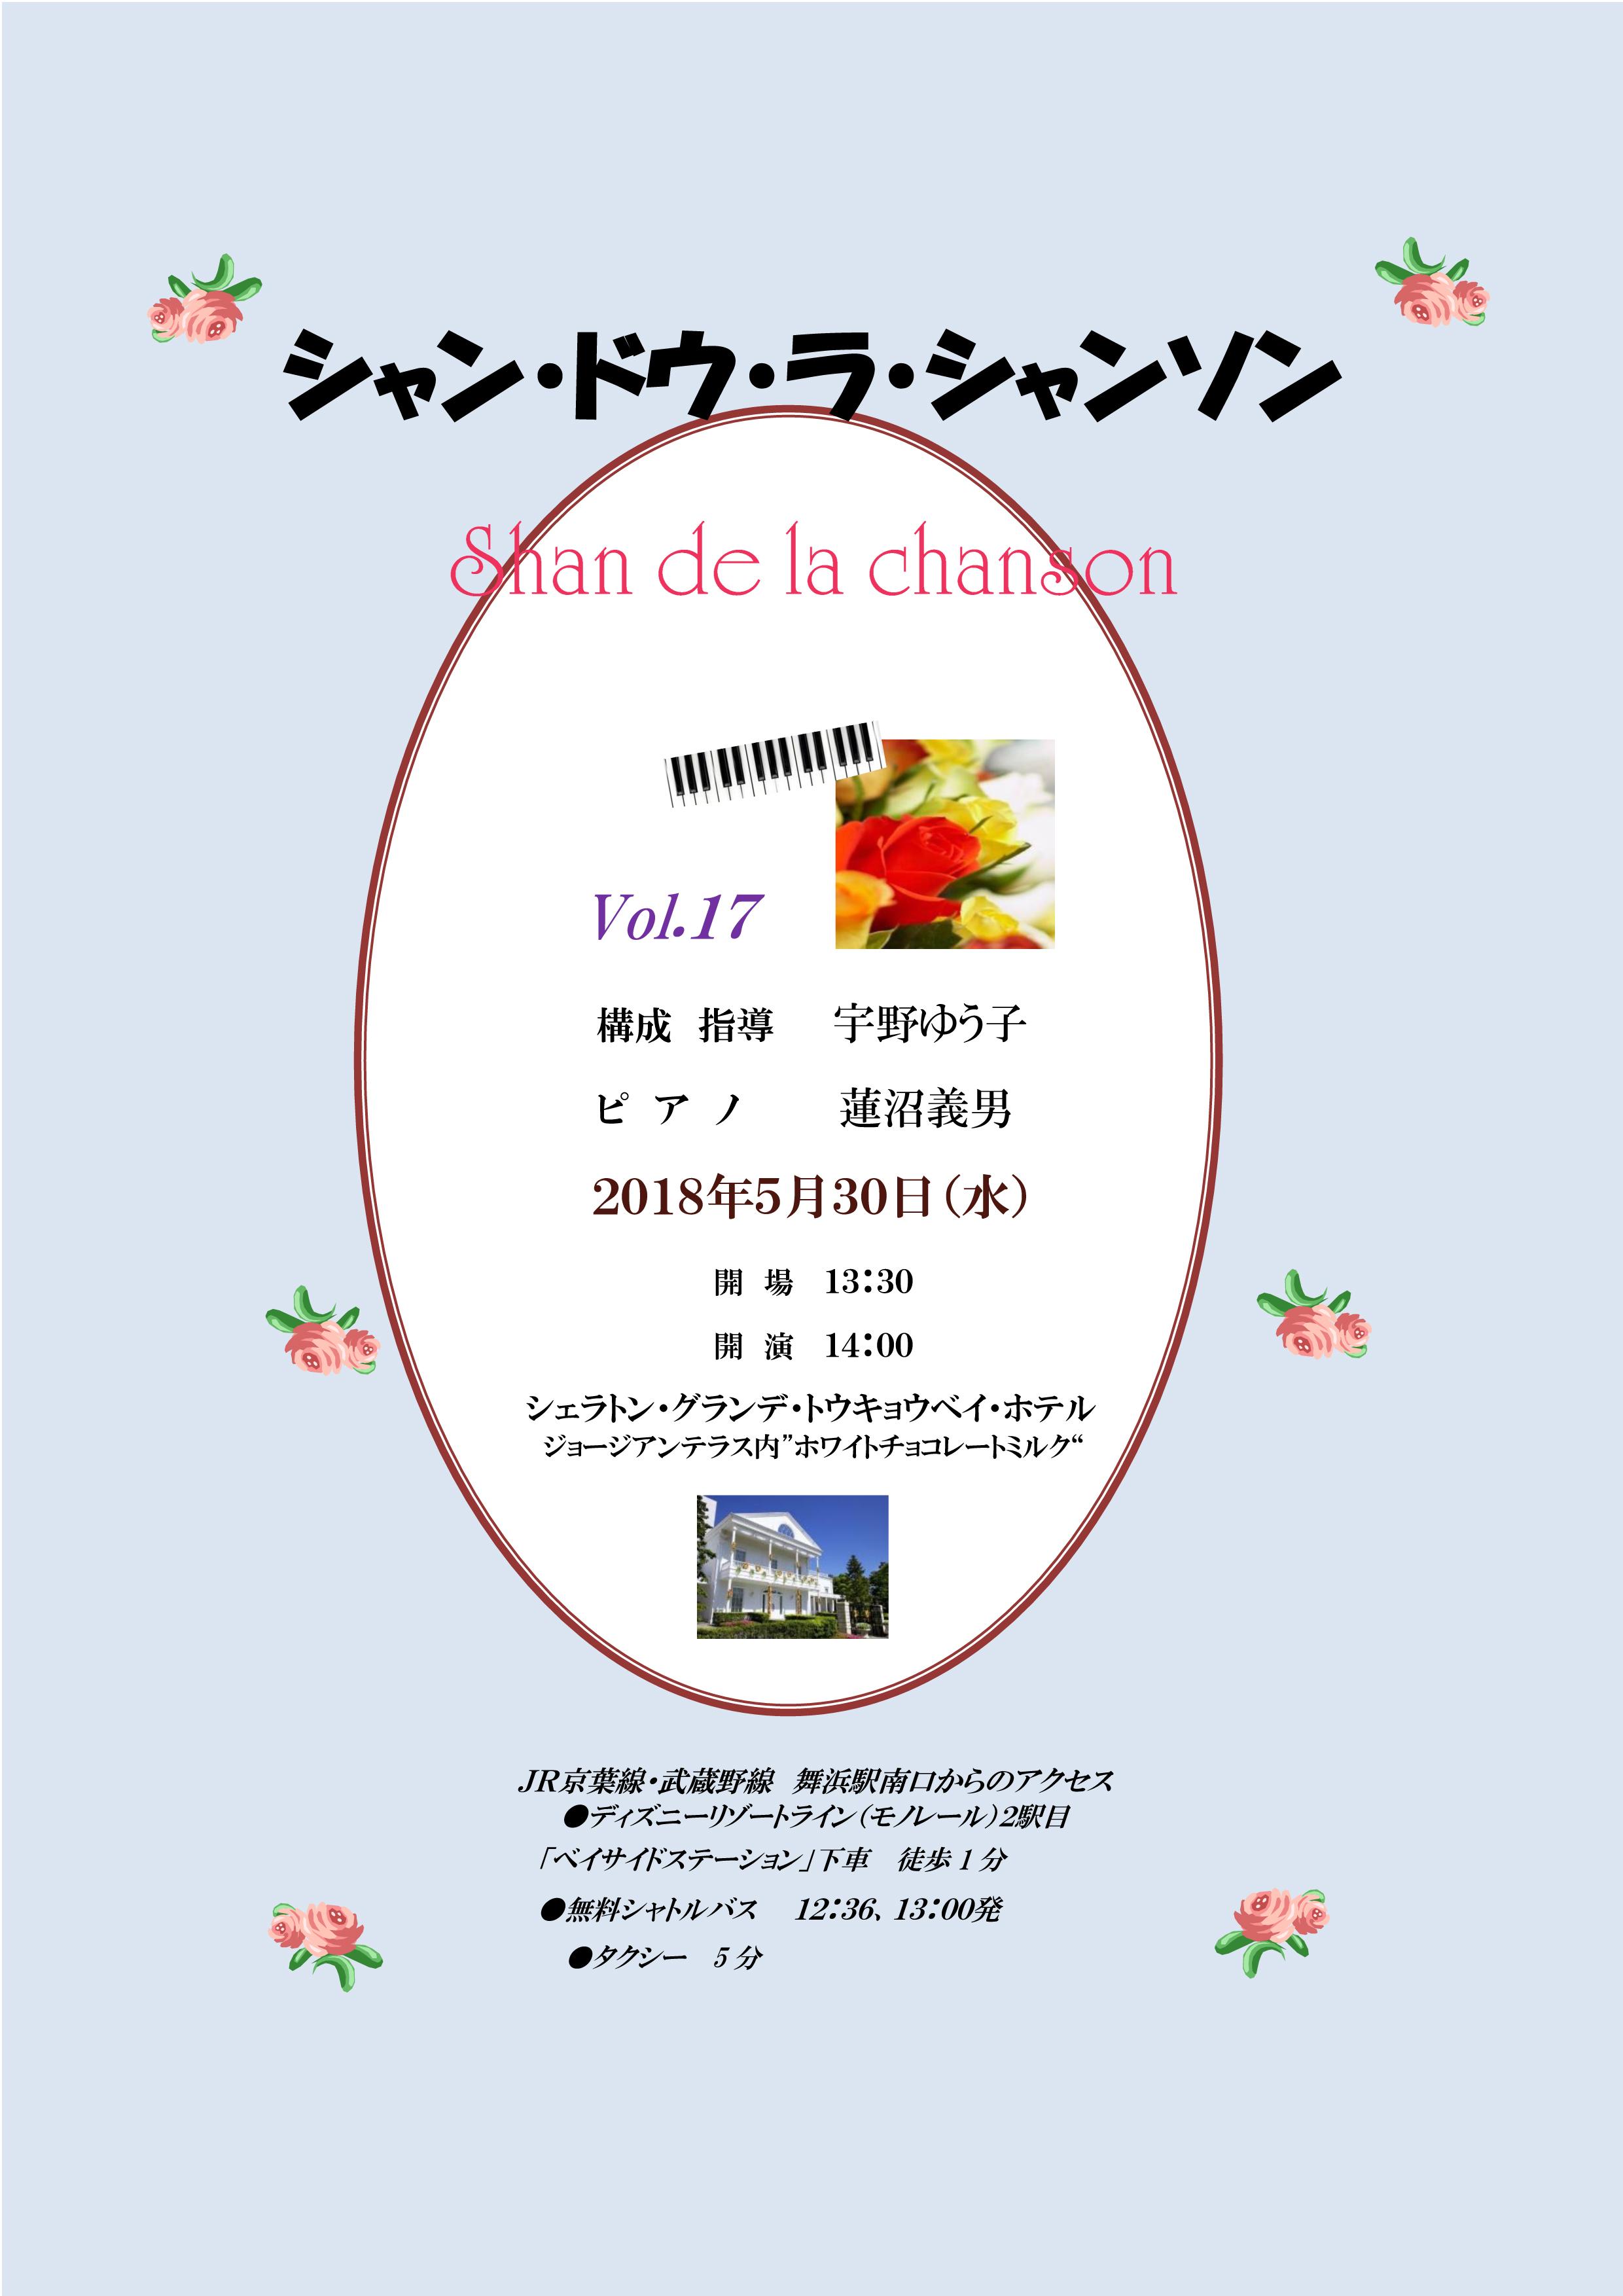 http://unoyuko.com/blog/chanson/Shan%20De%20La%20Chanson%20Vol.17.jpg